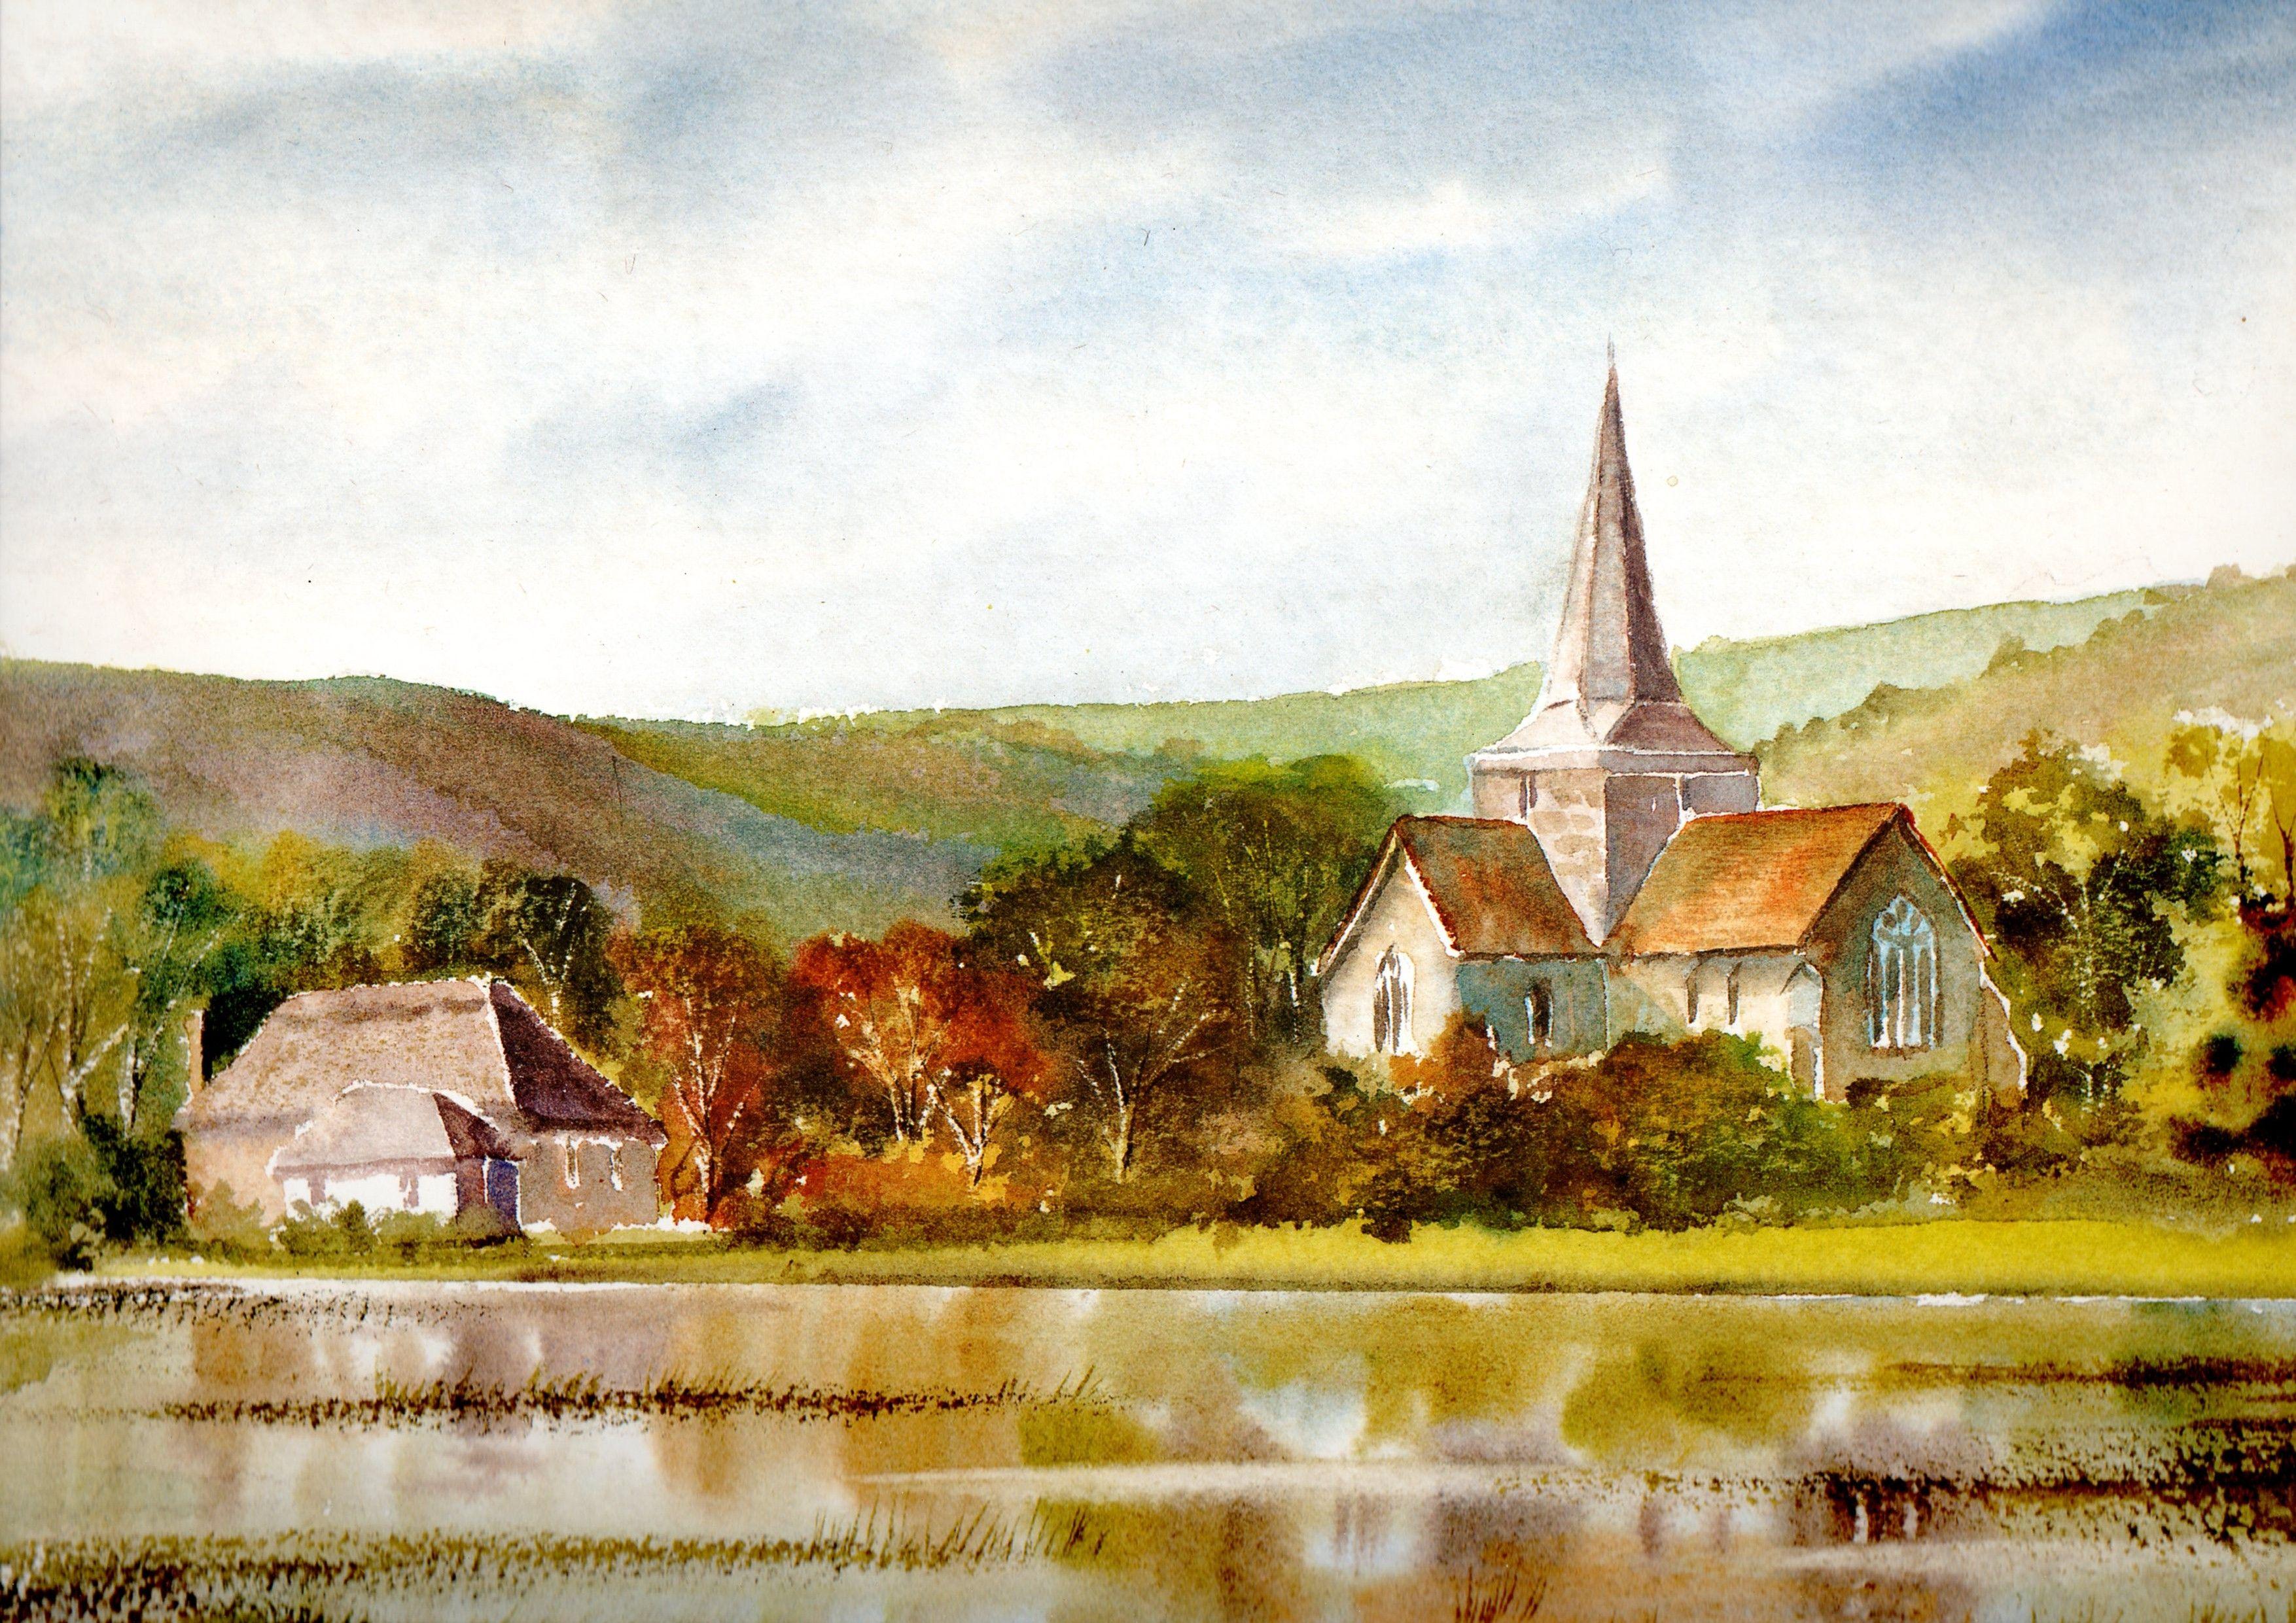 Alfriston landscape british art watercolor painting